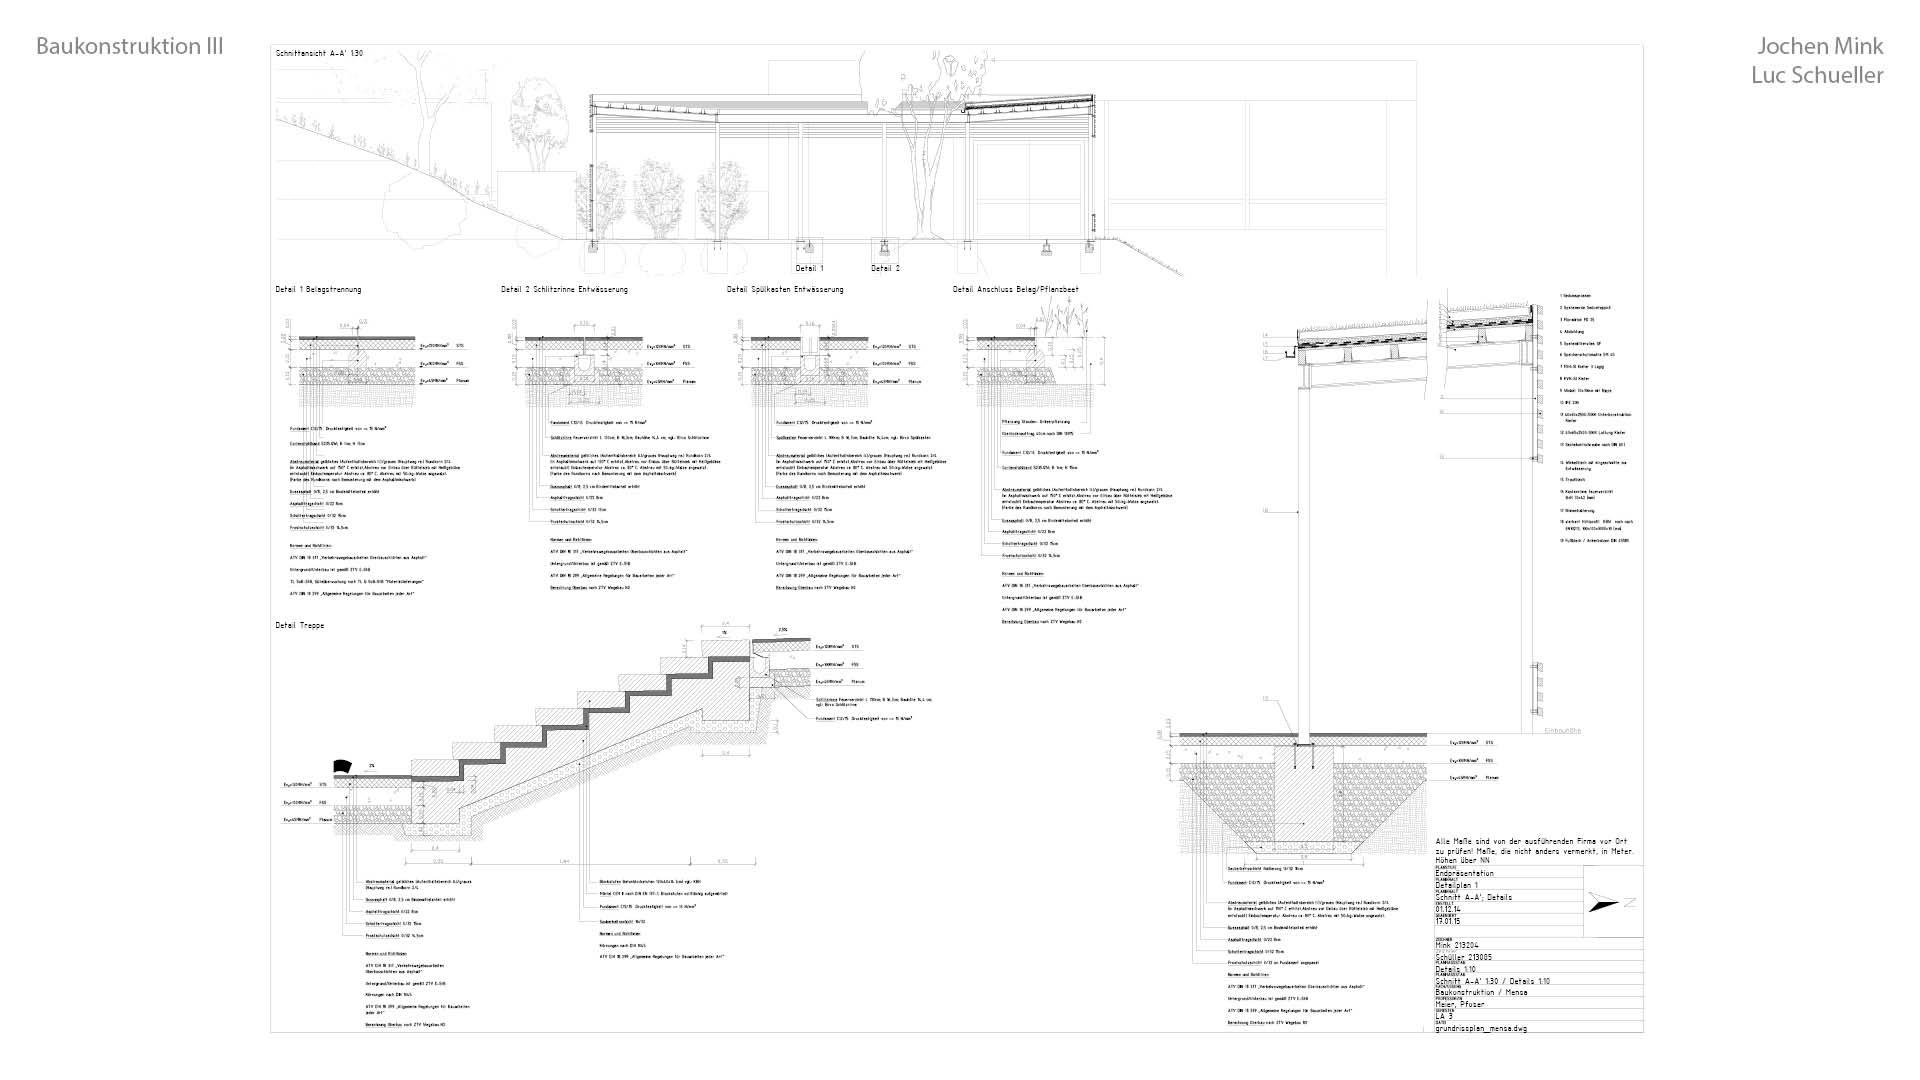 12 14 03 Baukonstruktion III